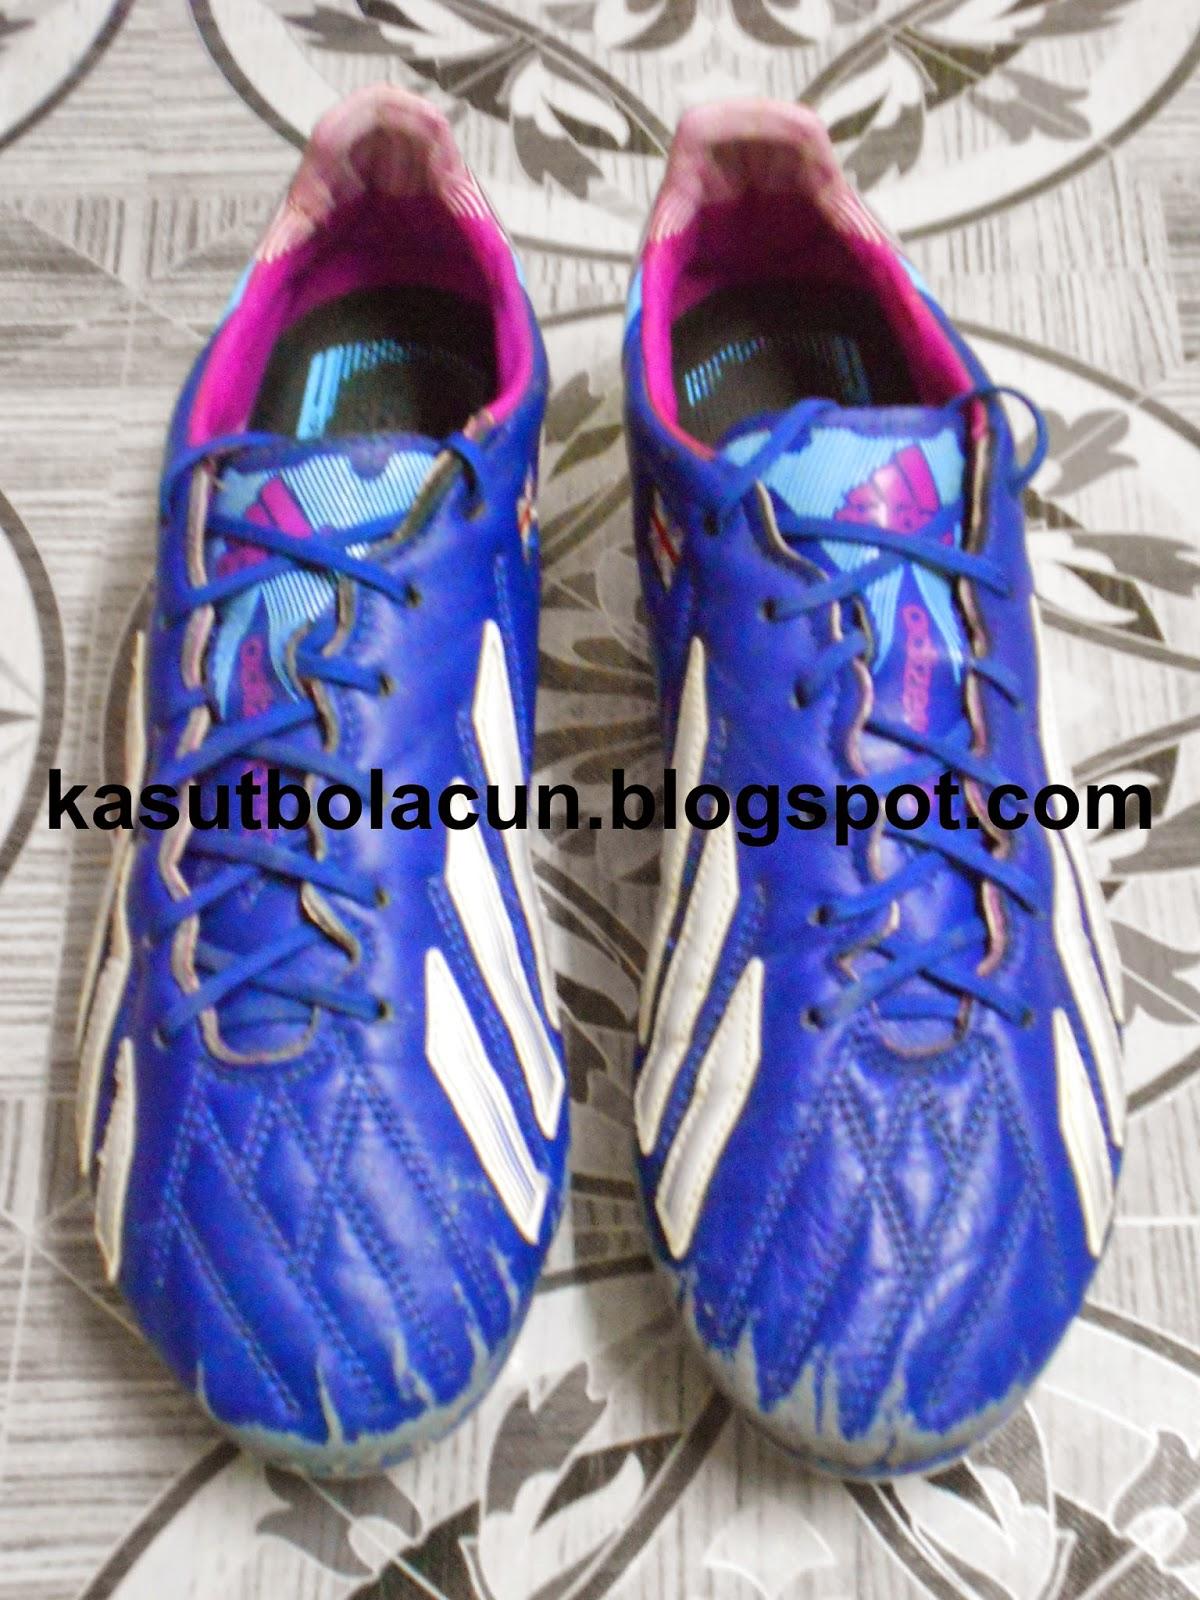 http://kasutbolacun.blogspot.com/2015/04/adidas-f50-adizero-micoach-2-sg_12.html